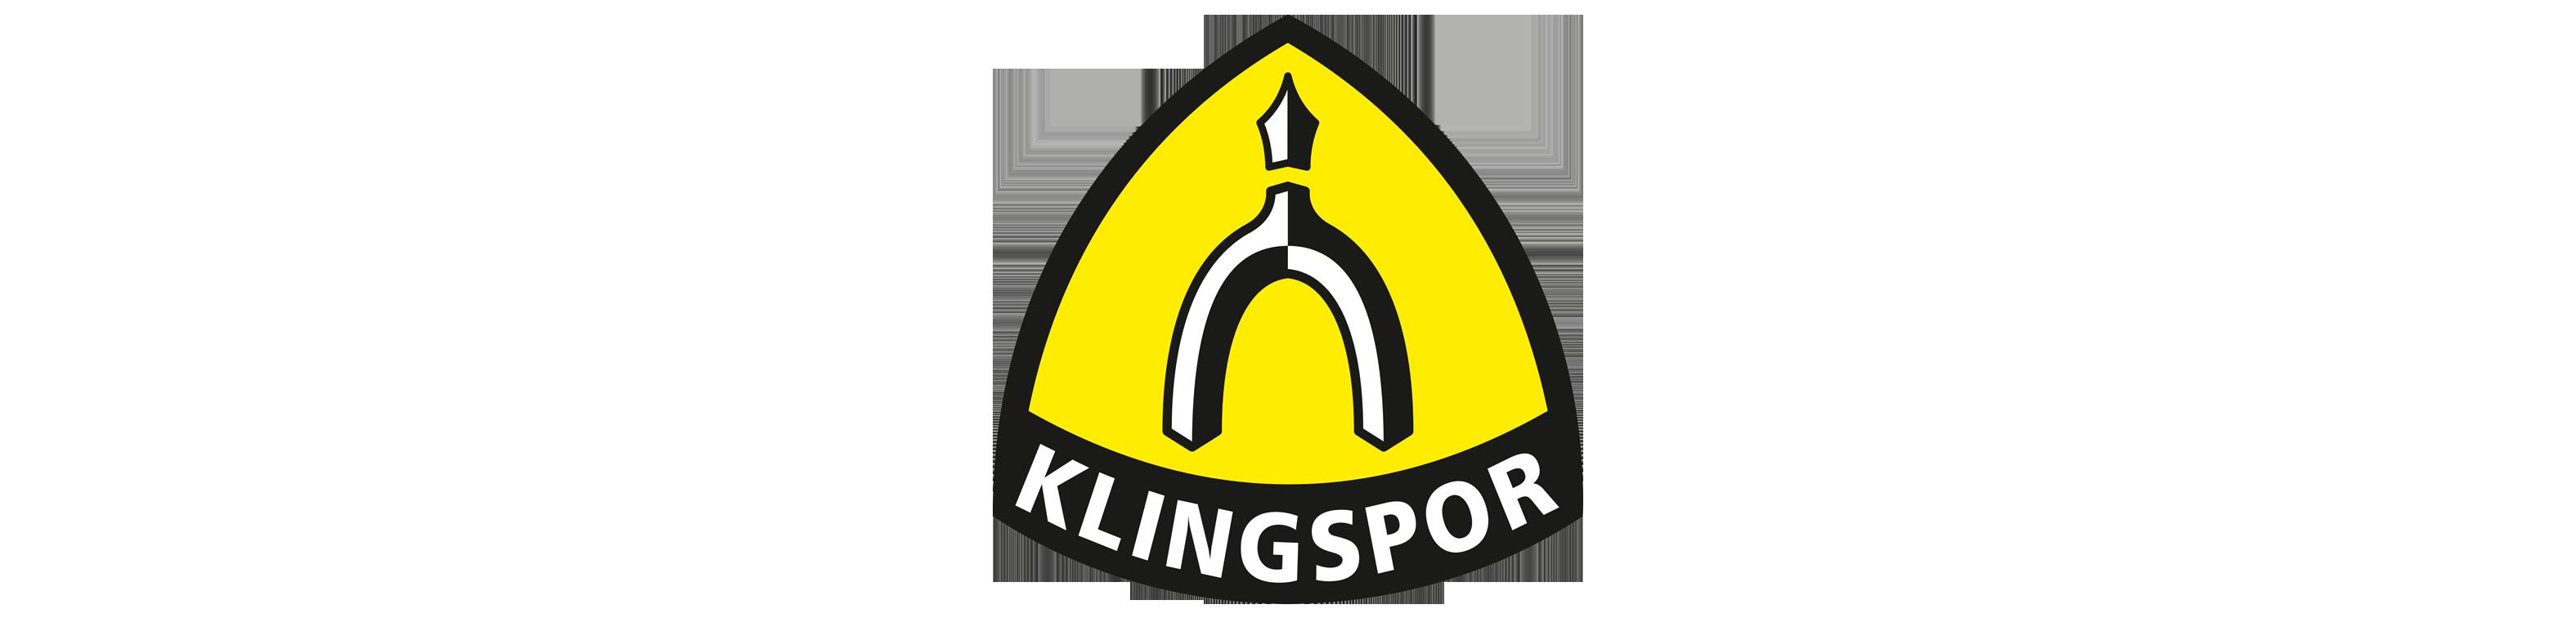 Klingspor - Case Study